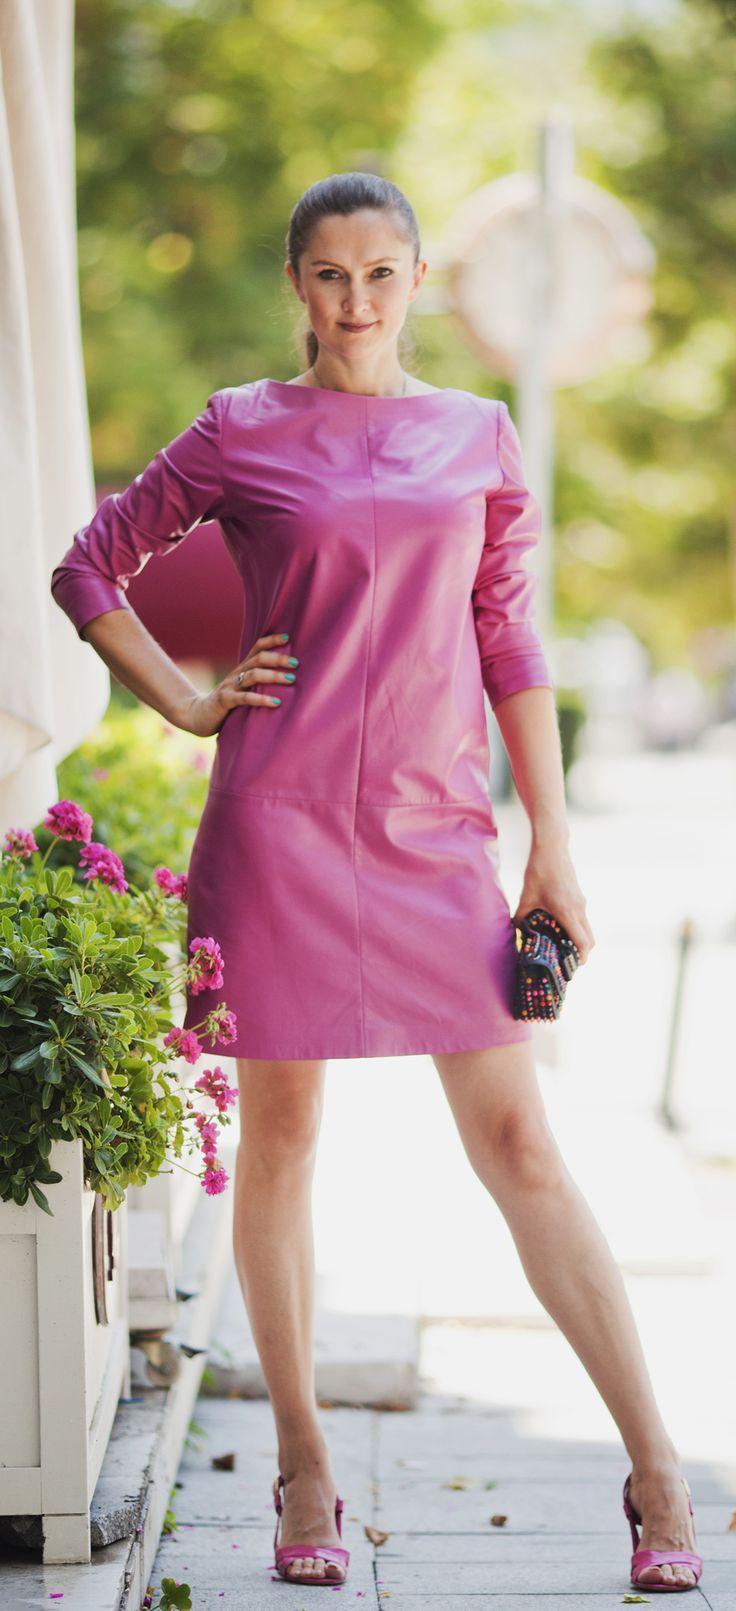 Pink leather dress by ADAMOFUR #inspiration #leather #leatherdress #pink #fashion